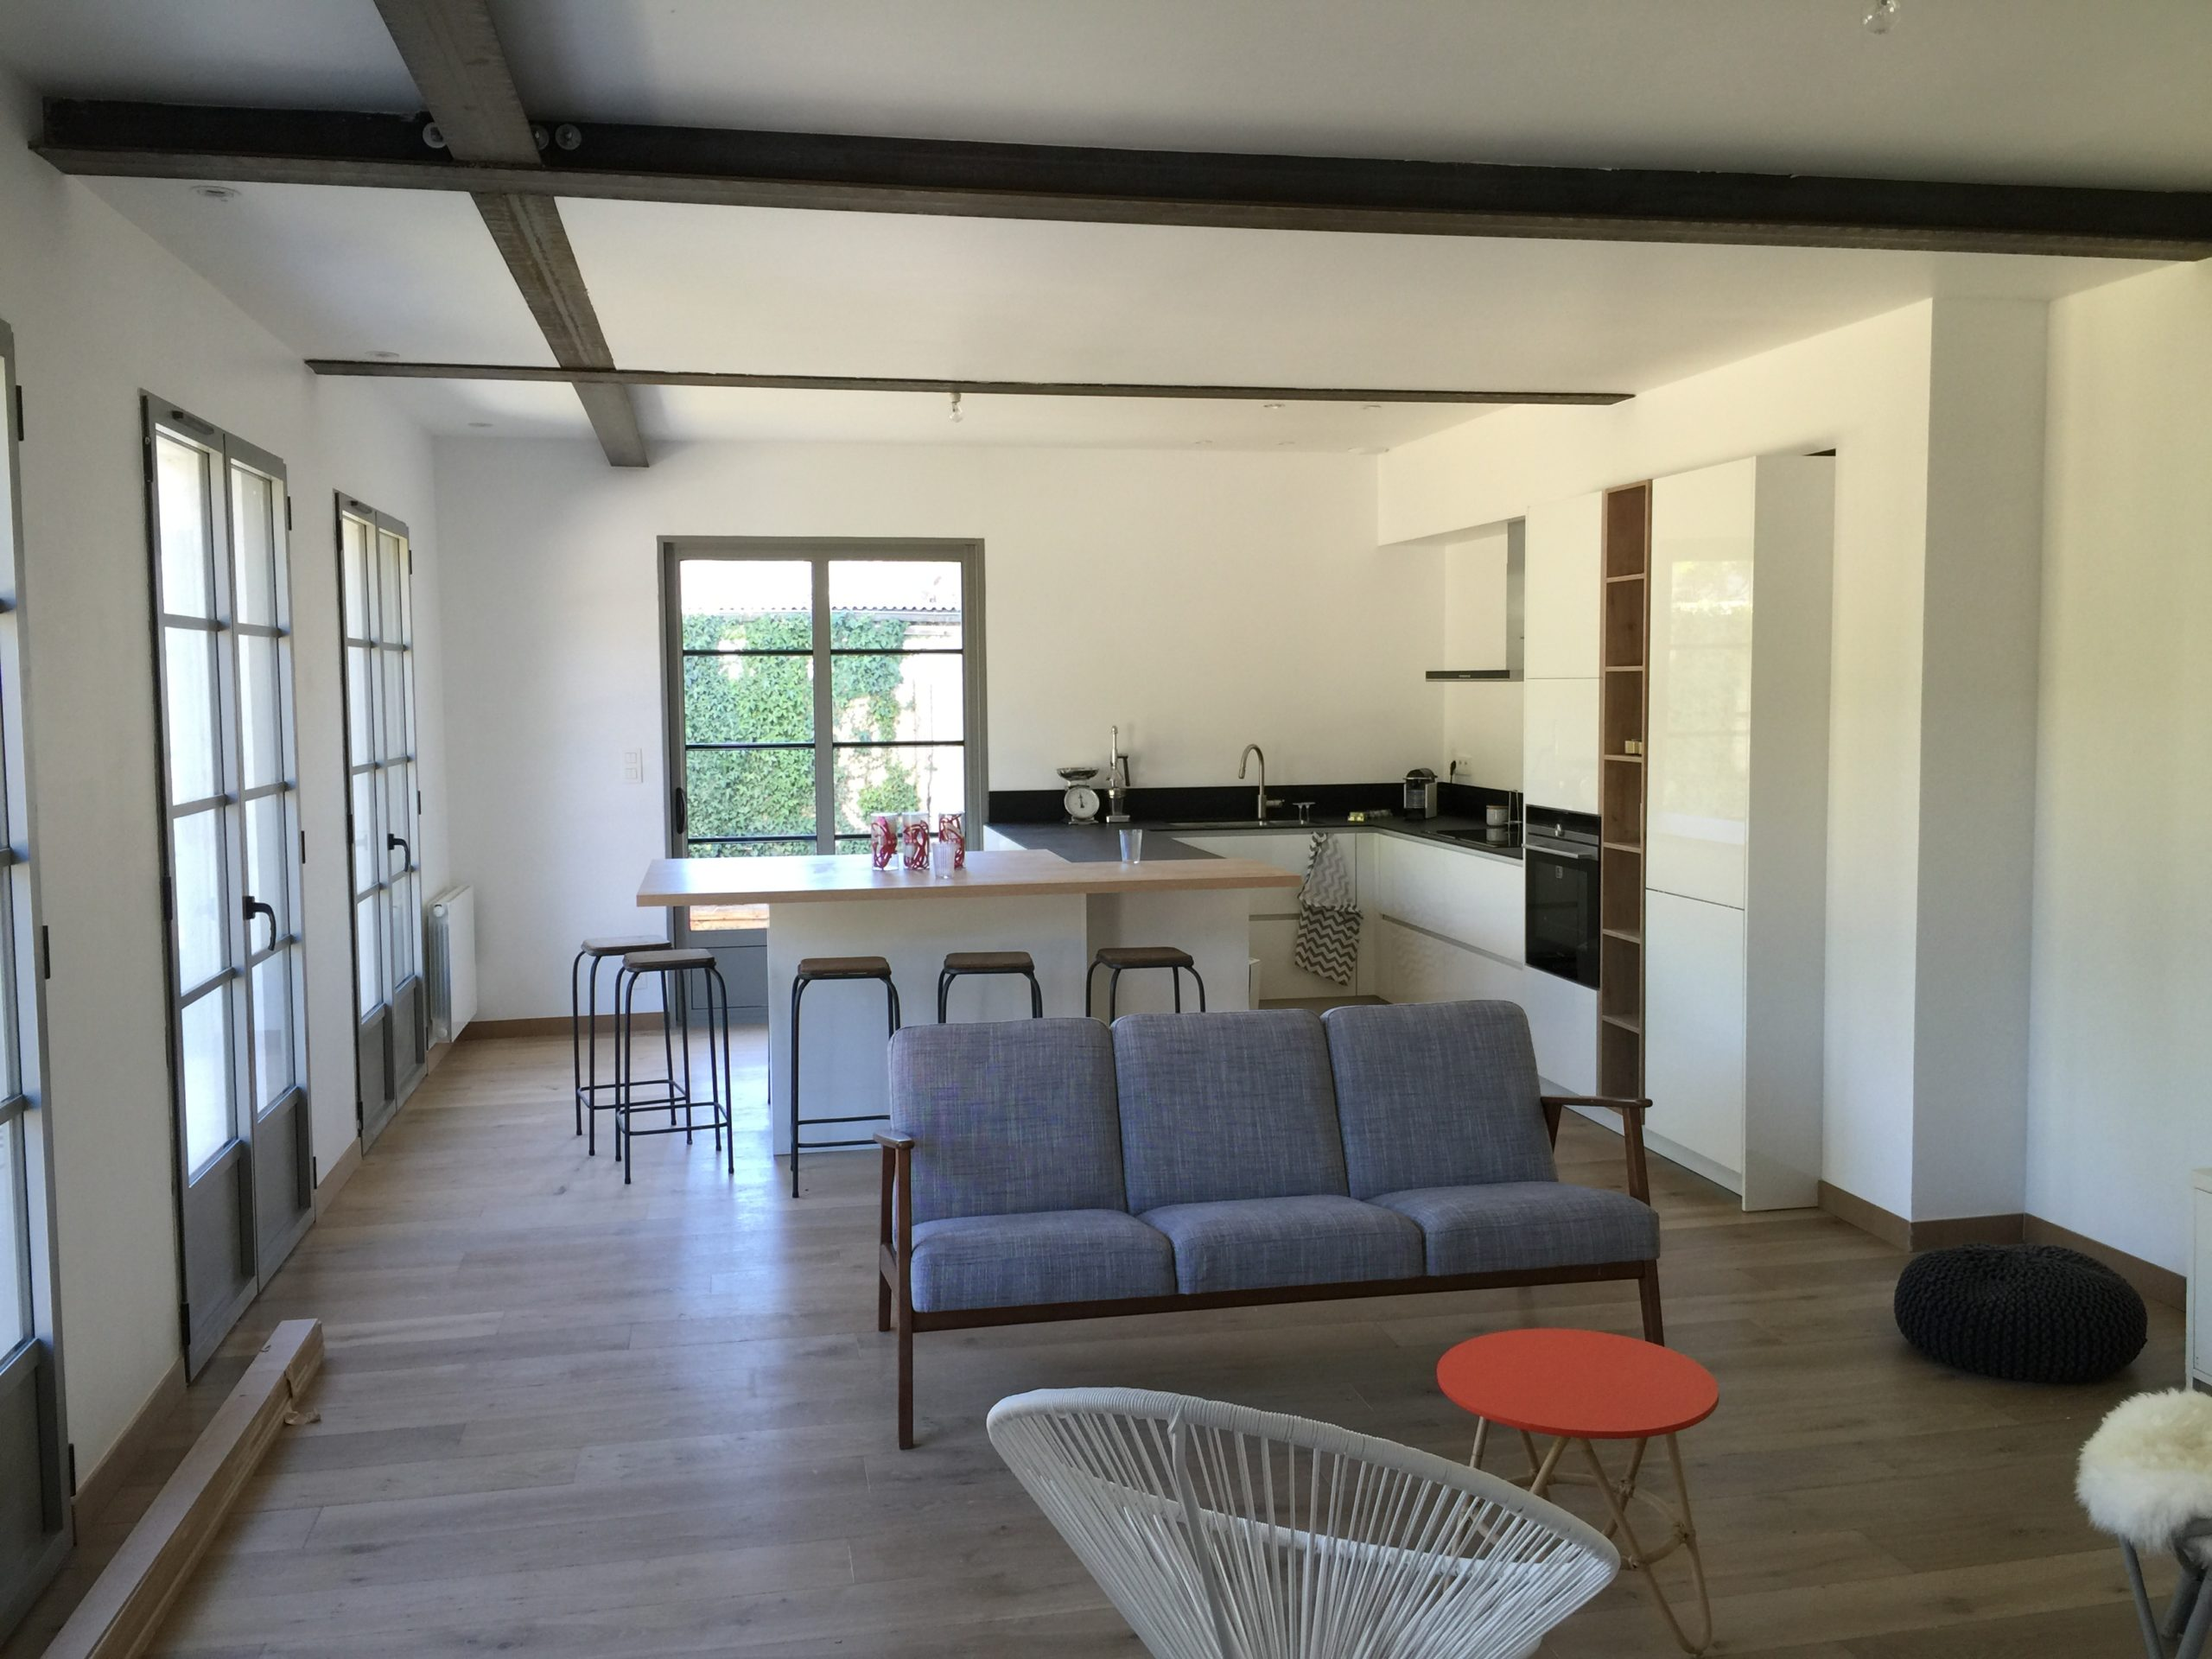 La Baule – Maison MAR gallery